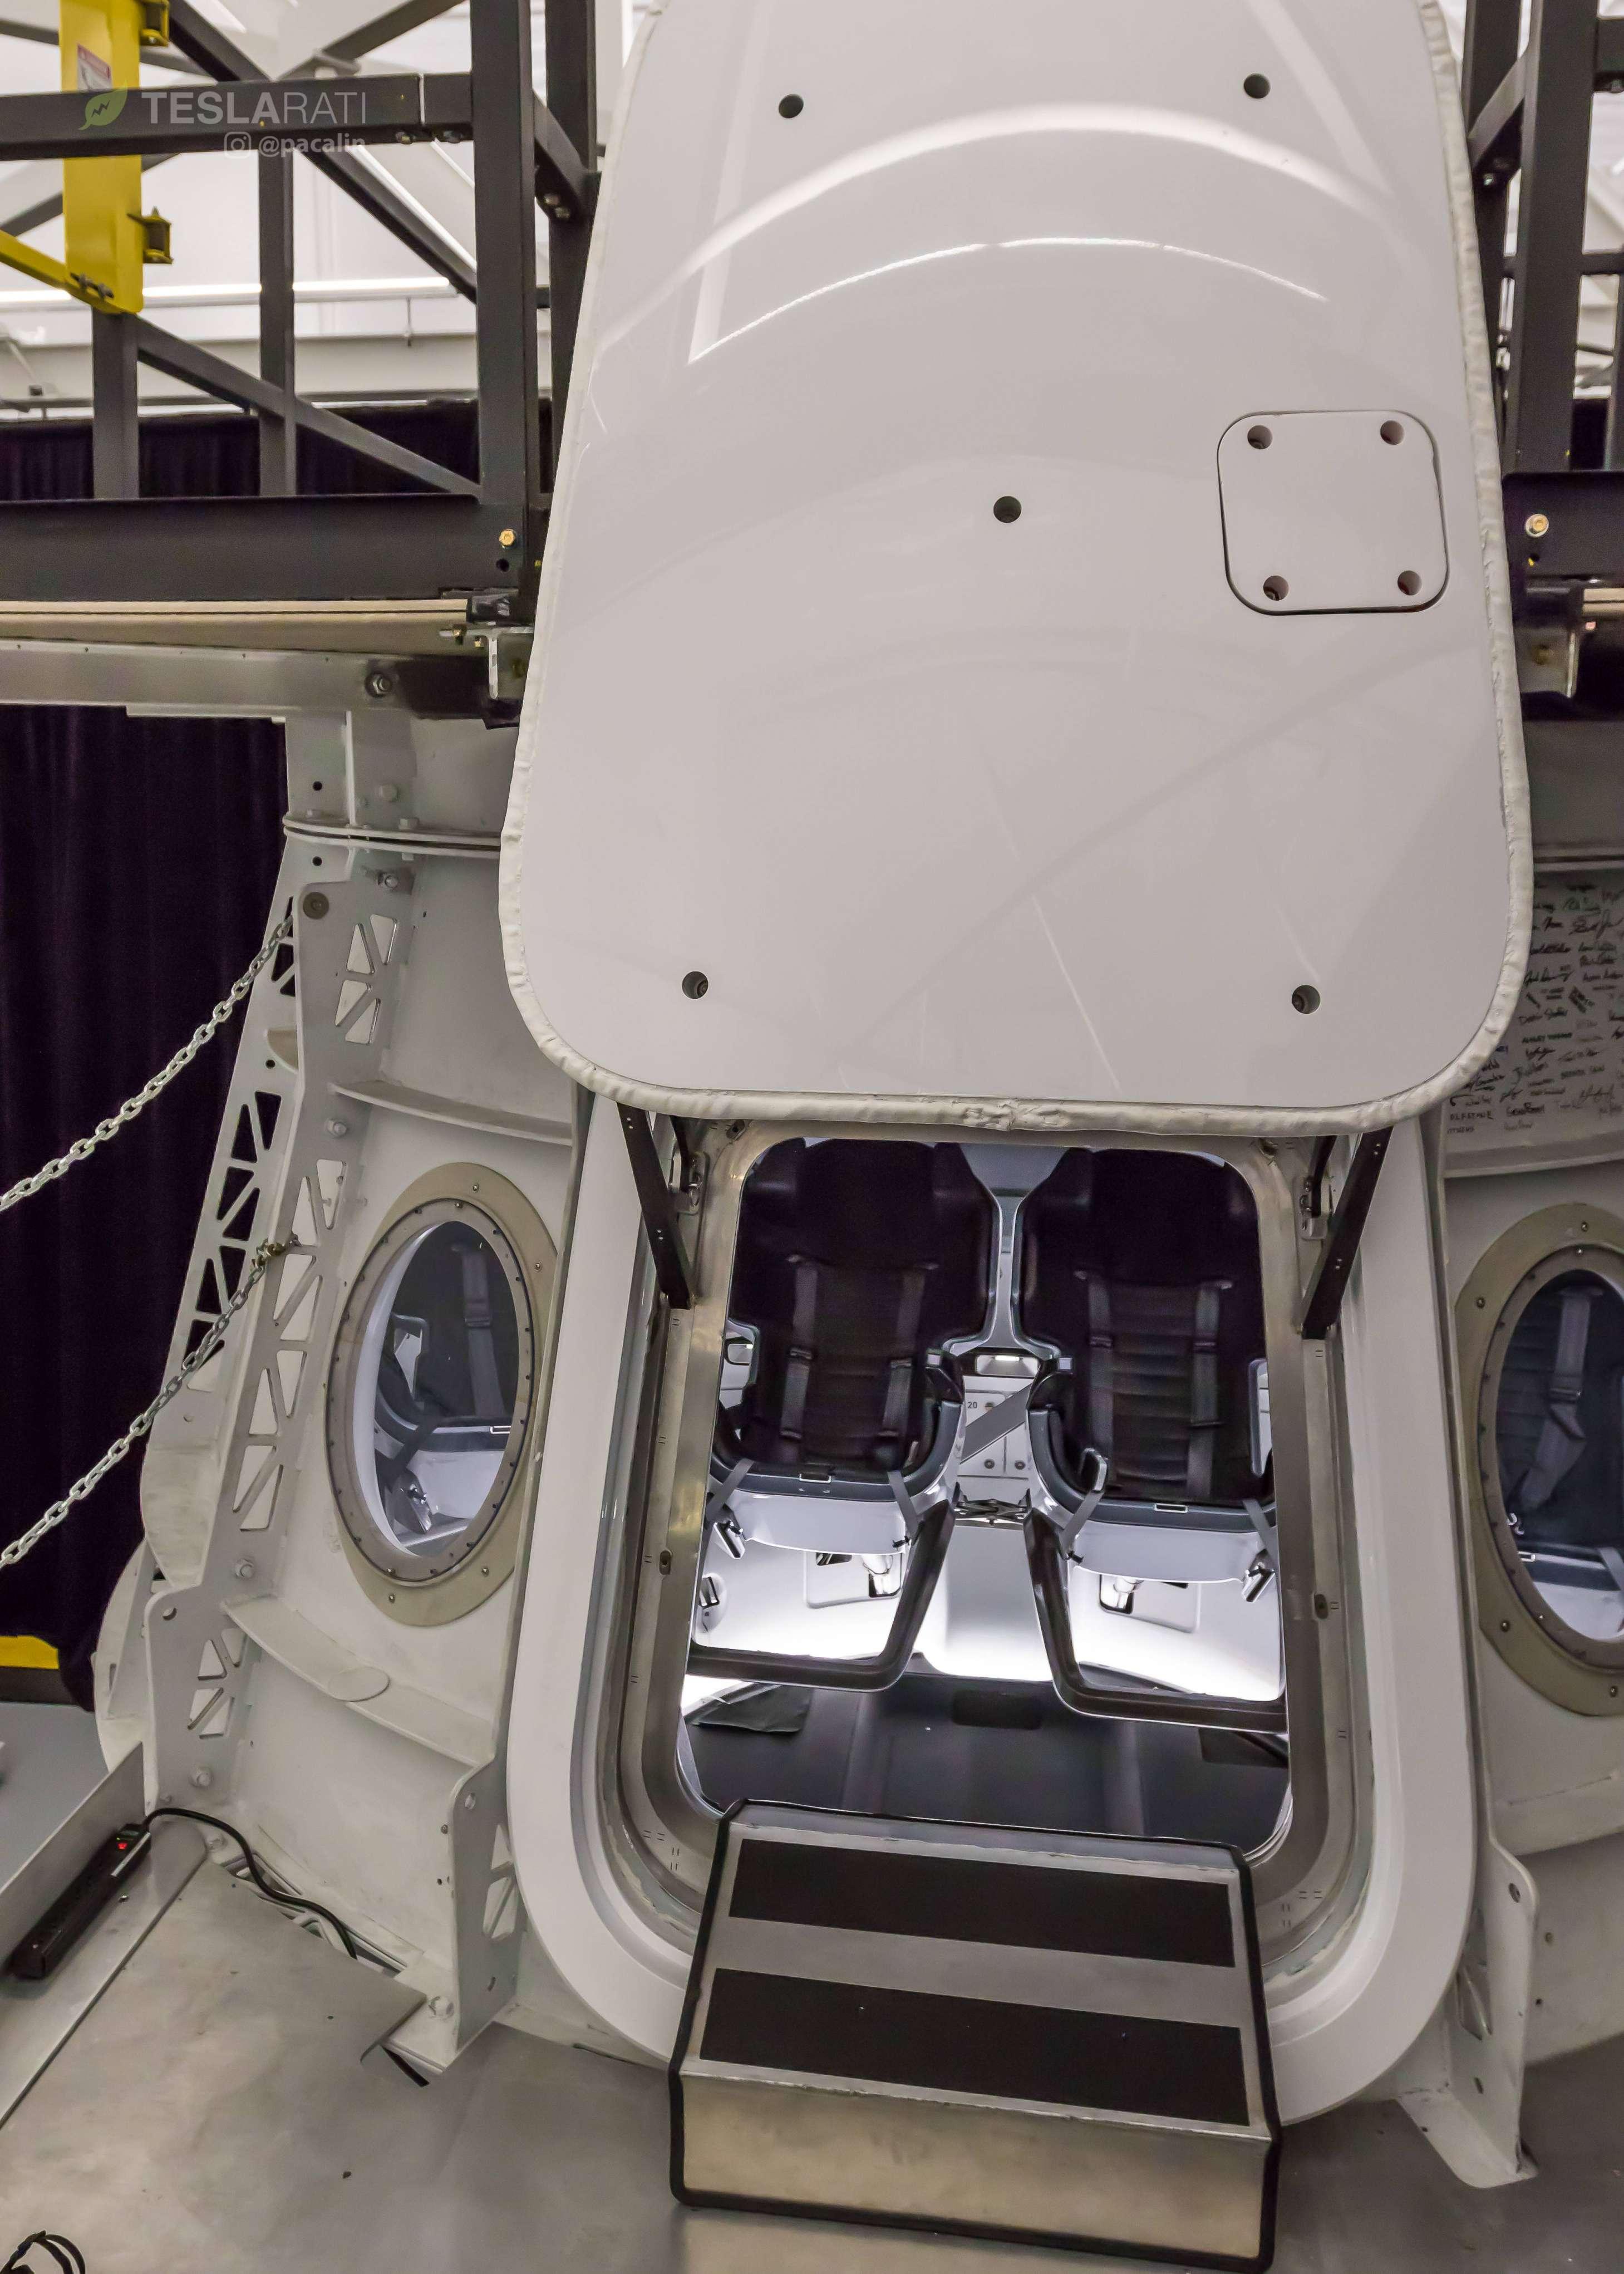 Crew Dragon simulator cabin 081318 (SpaceX) 2 (c)